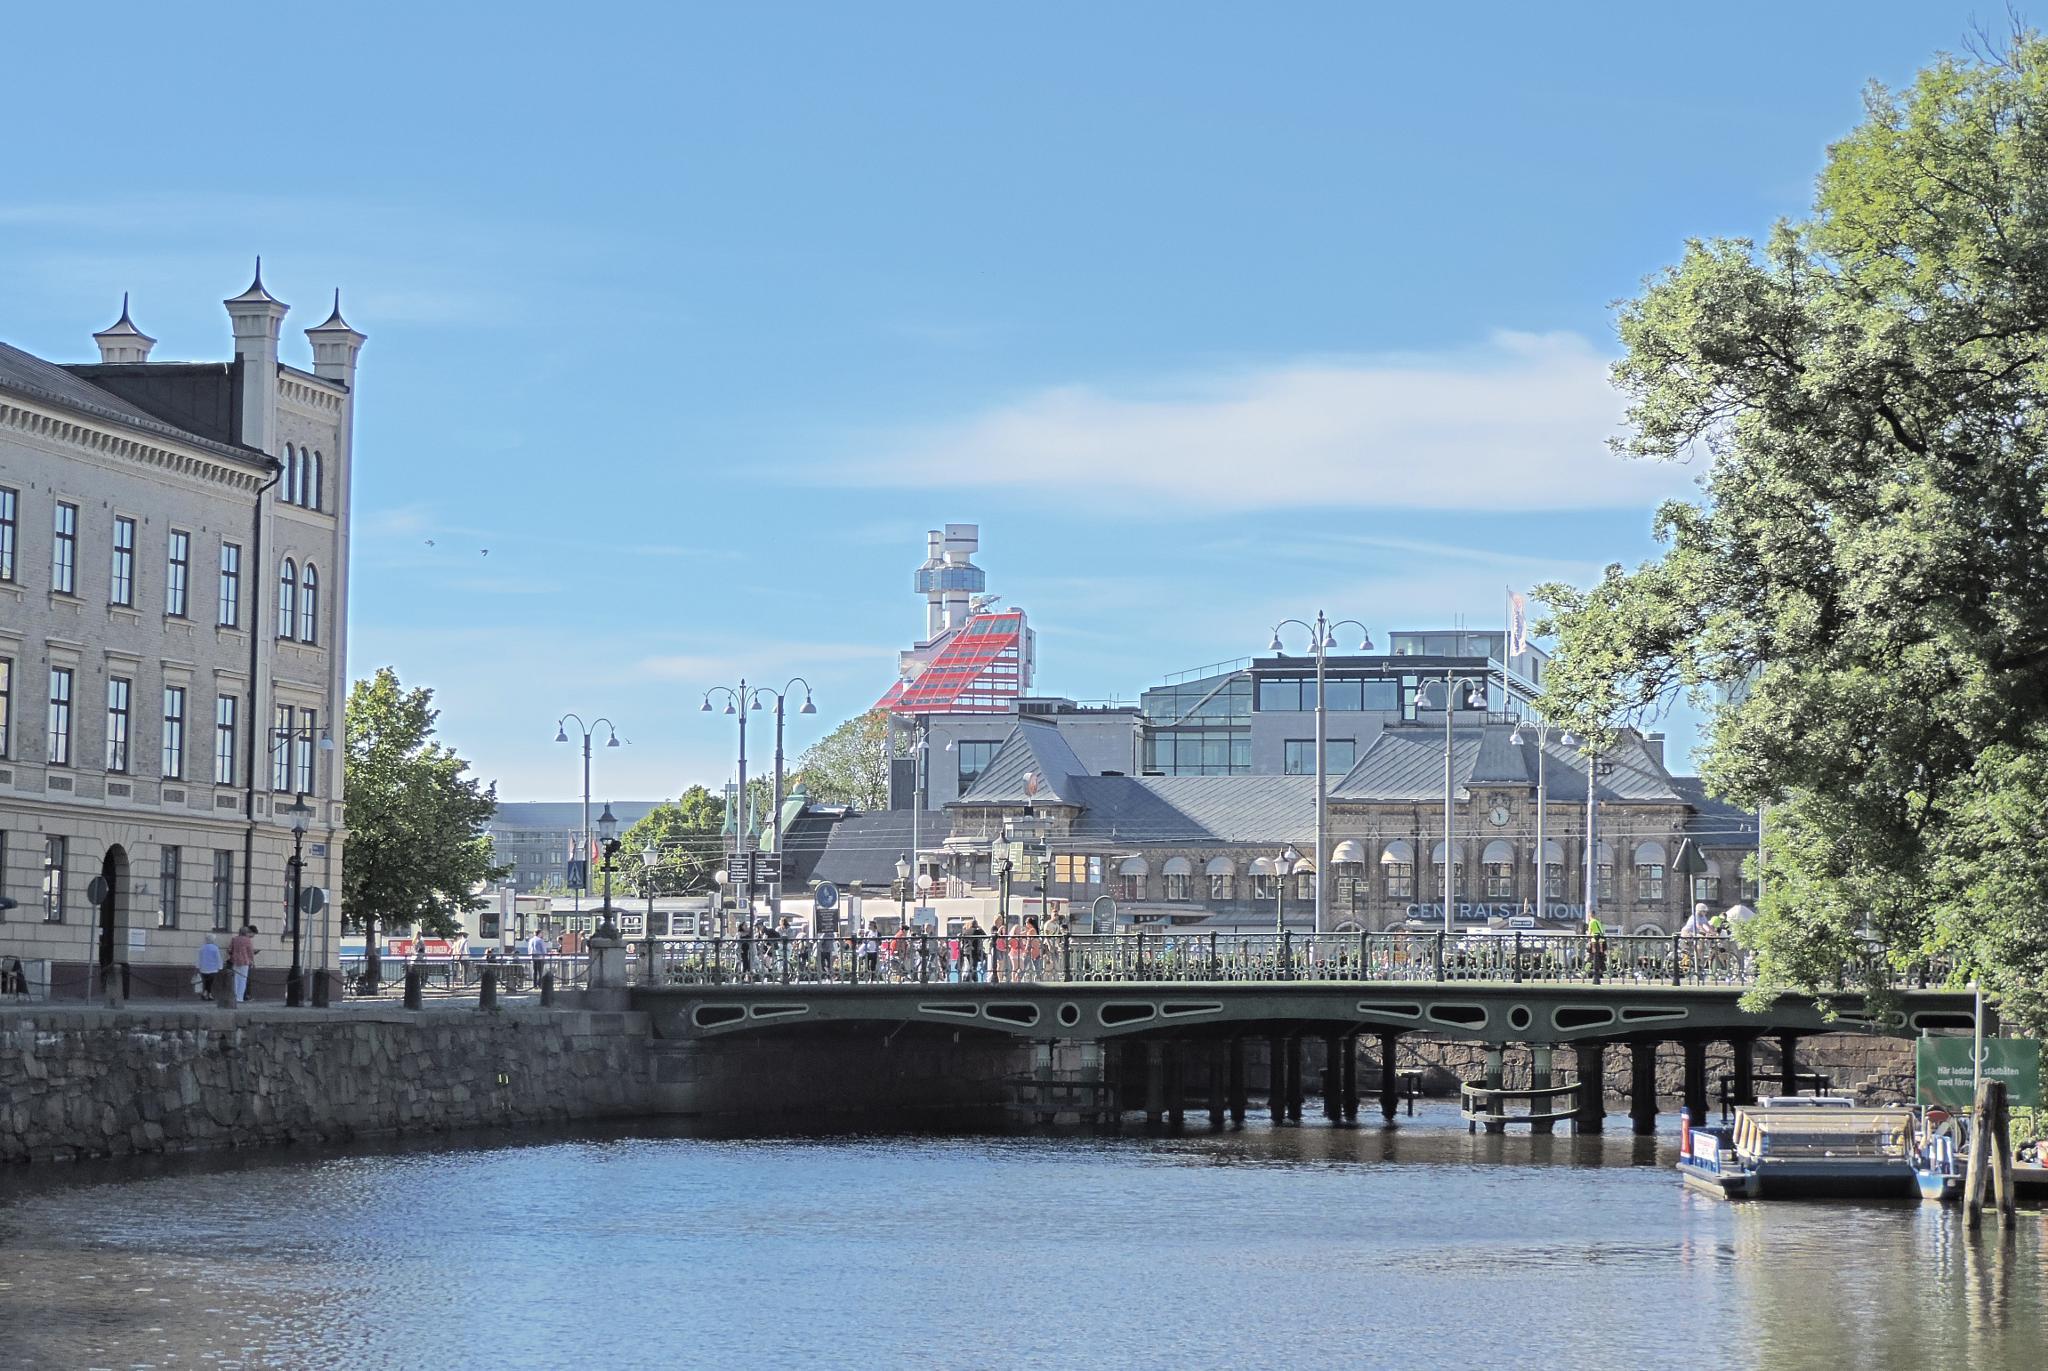 Gothenburg Central Station by paul_wallen